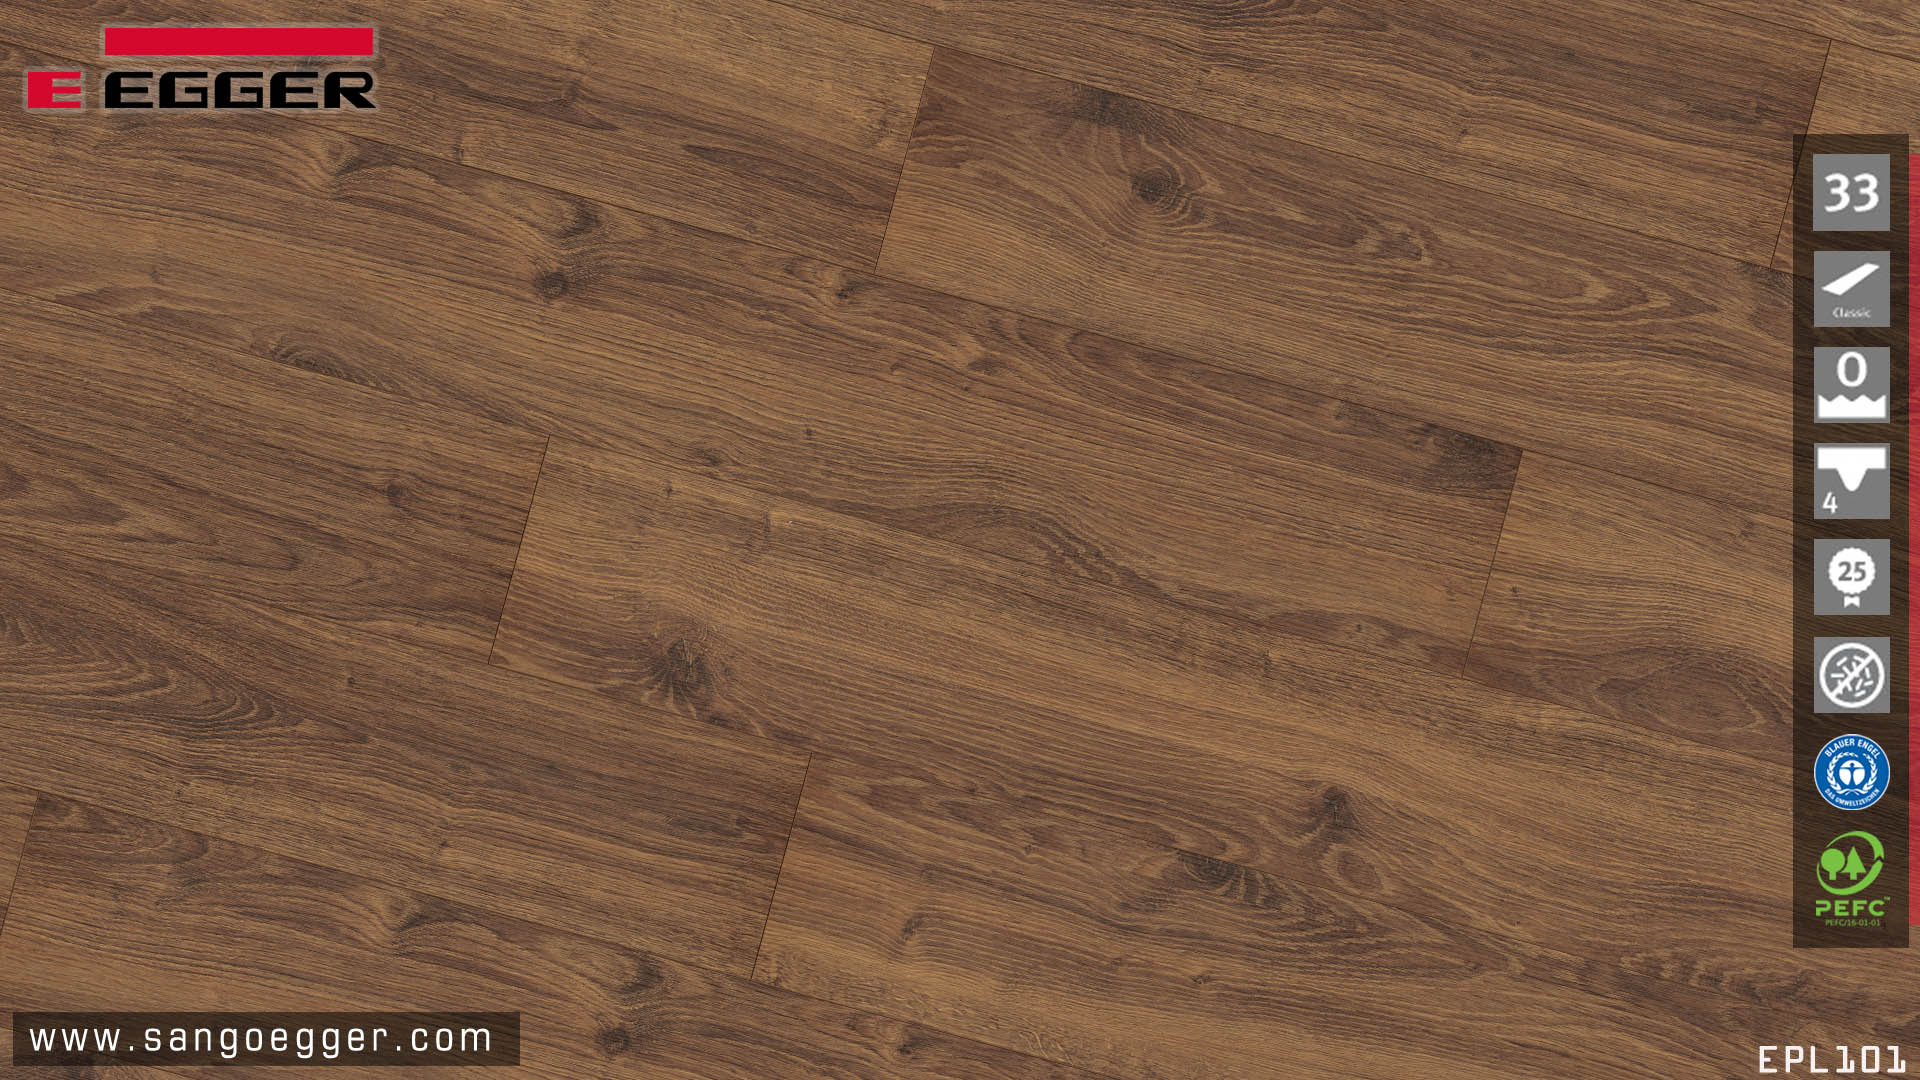 Sàn gỗ Egger Pro Aqua EPL101 12mm - bề mặt vân